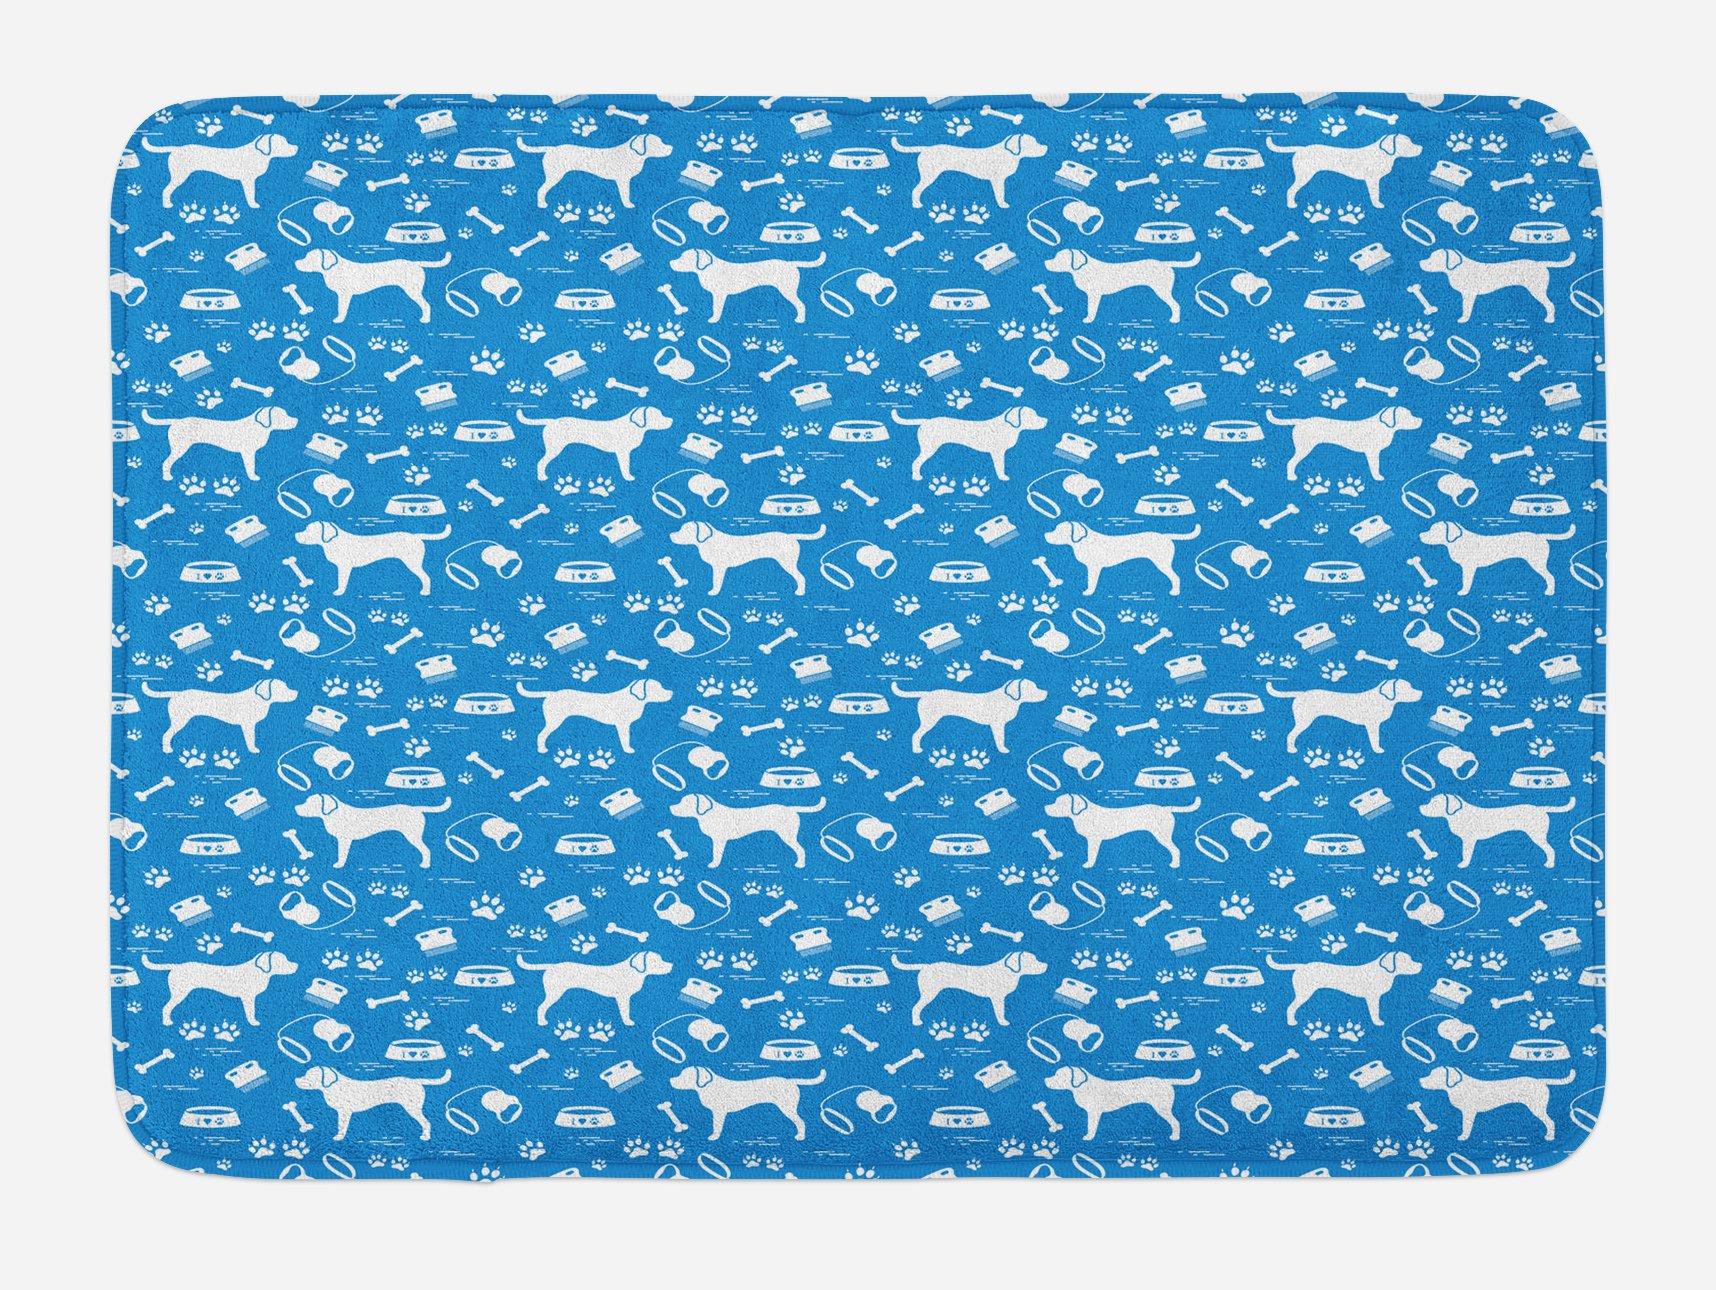 Lunarable Rottweiler Bath Mat, Pets Theme with Bone Paws Leash Food Bowl Collar Brush Cute Animal Design, Plush Bathroom Decor Mat with Non Slip Backing, 29.5 W X 17.5 W Inches, Blue and White